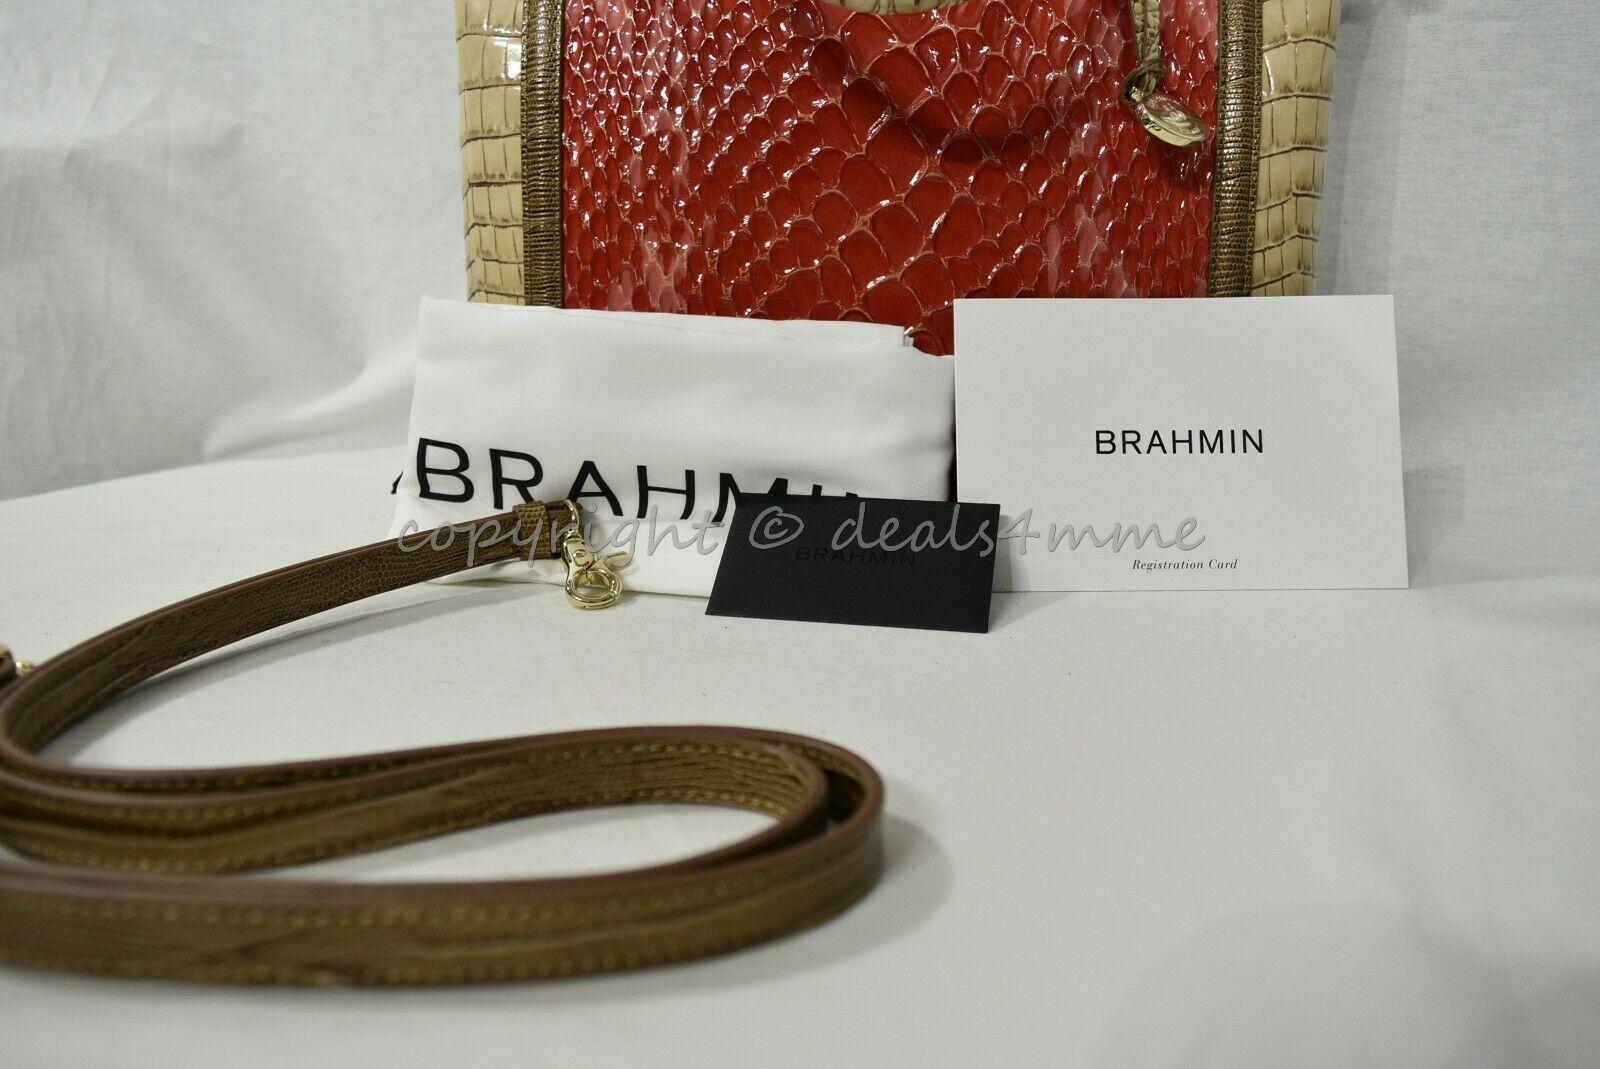 NWT Brahmin Large Duxbury Satchel/Shoulder Bag in Candy Apple Carlisle image 10